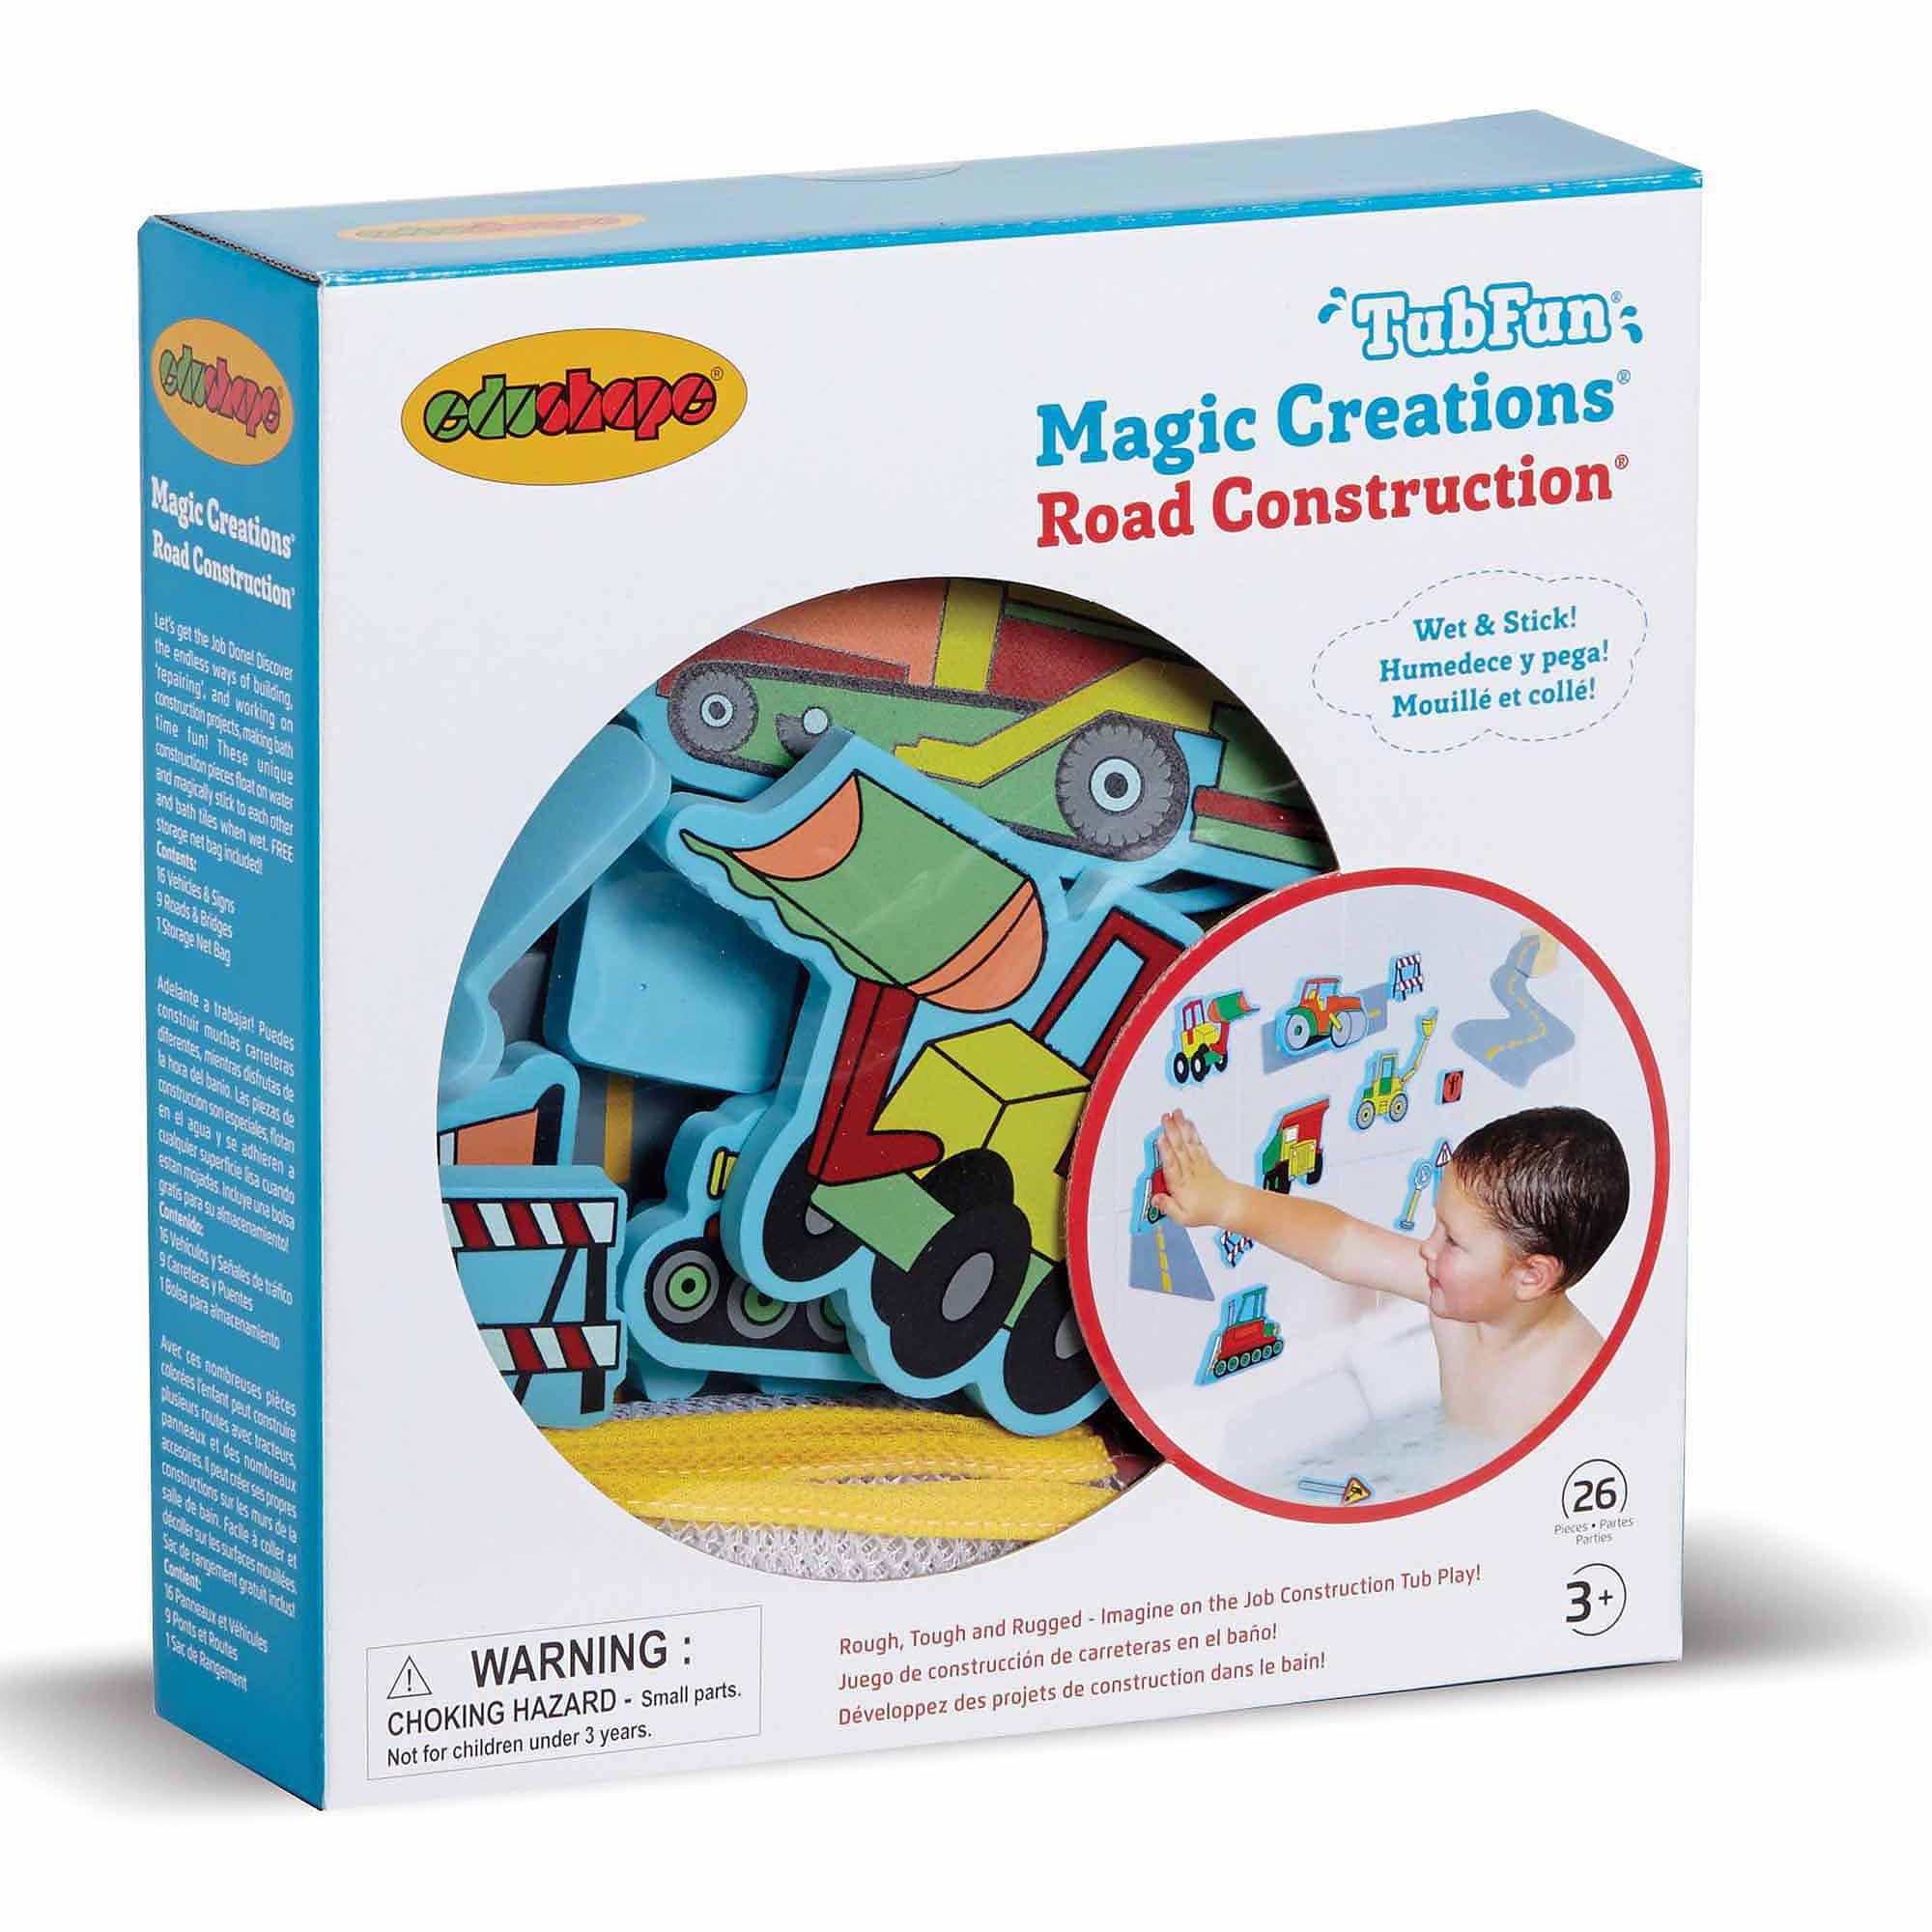 Magic Creation, Road Construction by Edushape